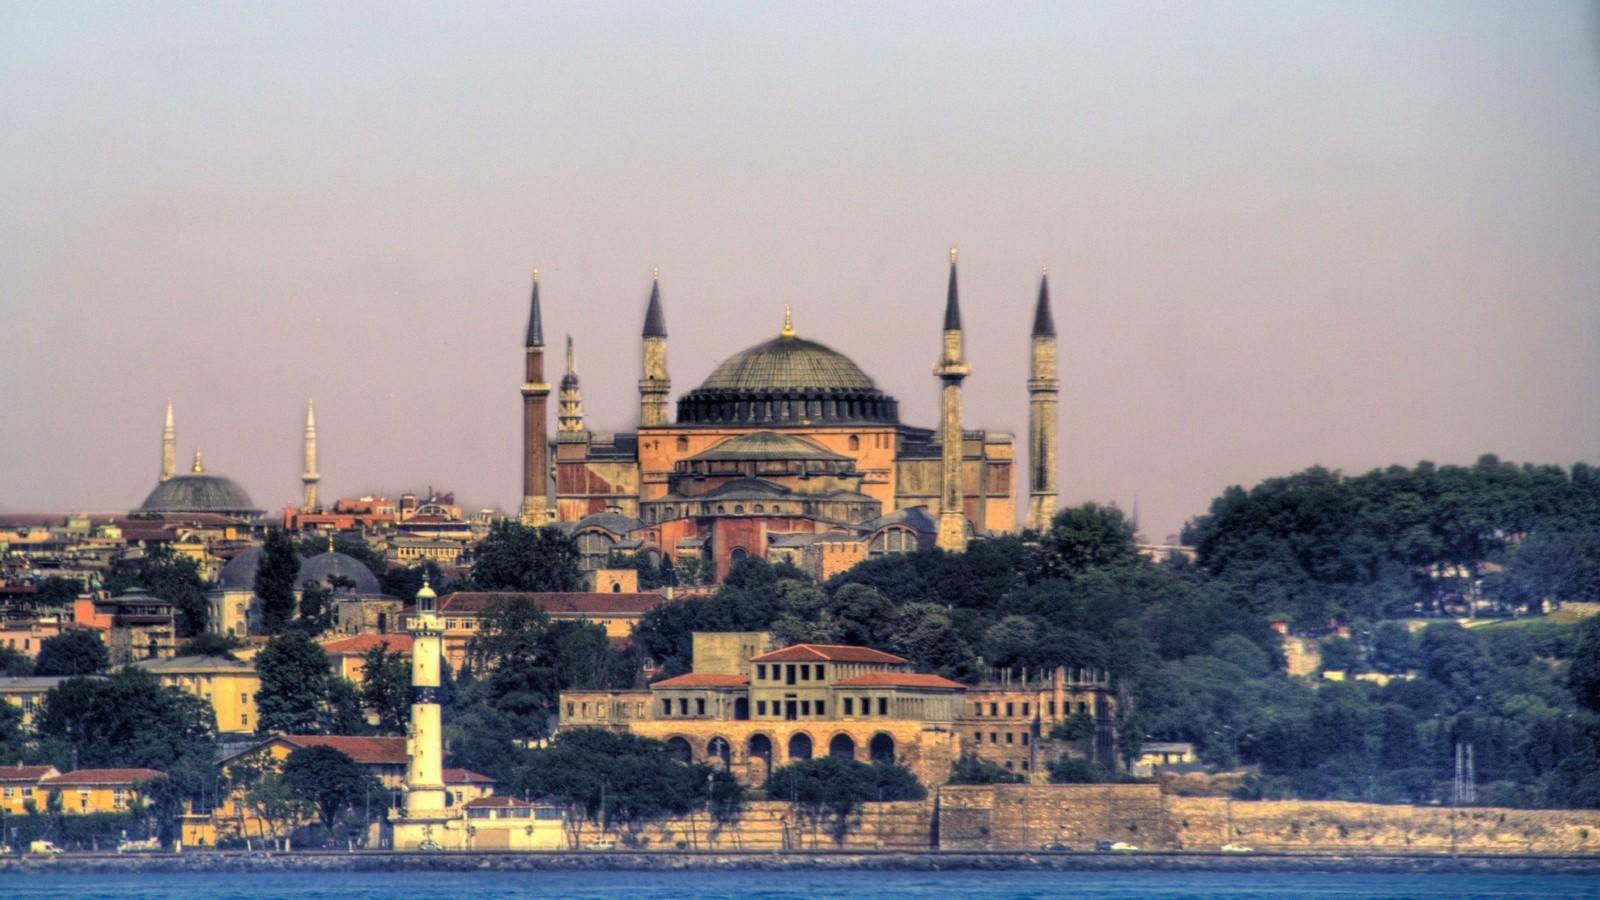 The Hagia Sophia still dominates the skyline of Istanbul